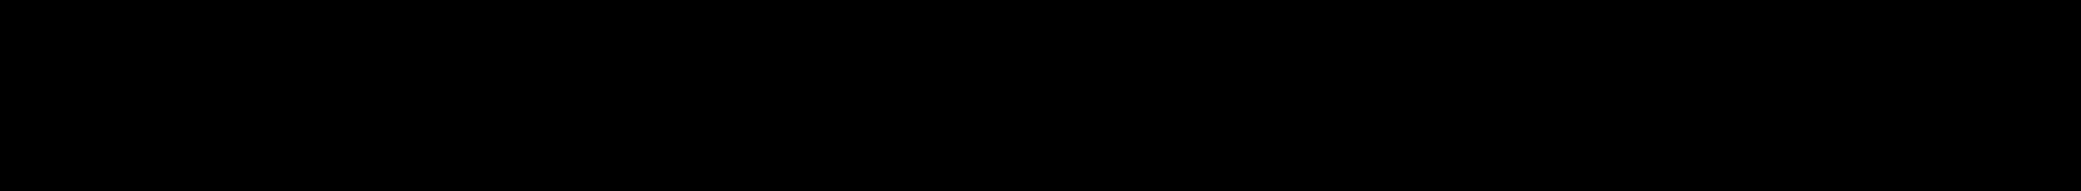 Design System G 500R